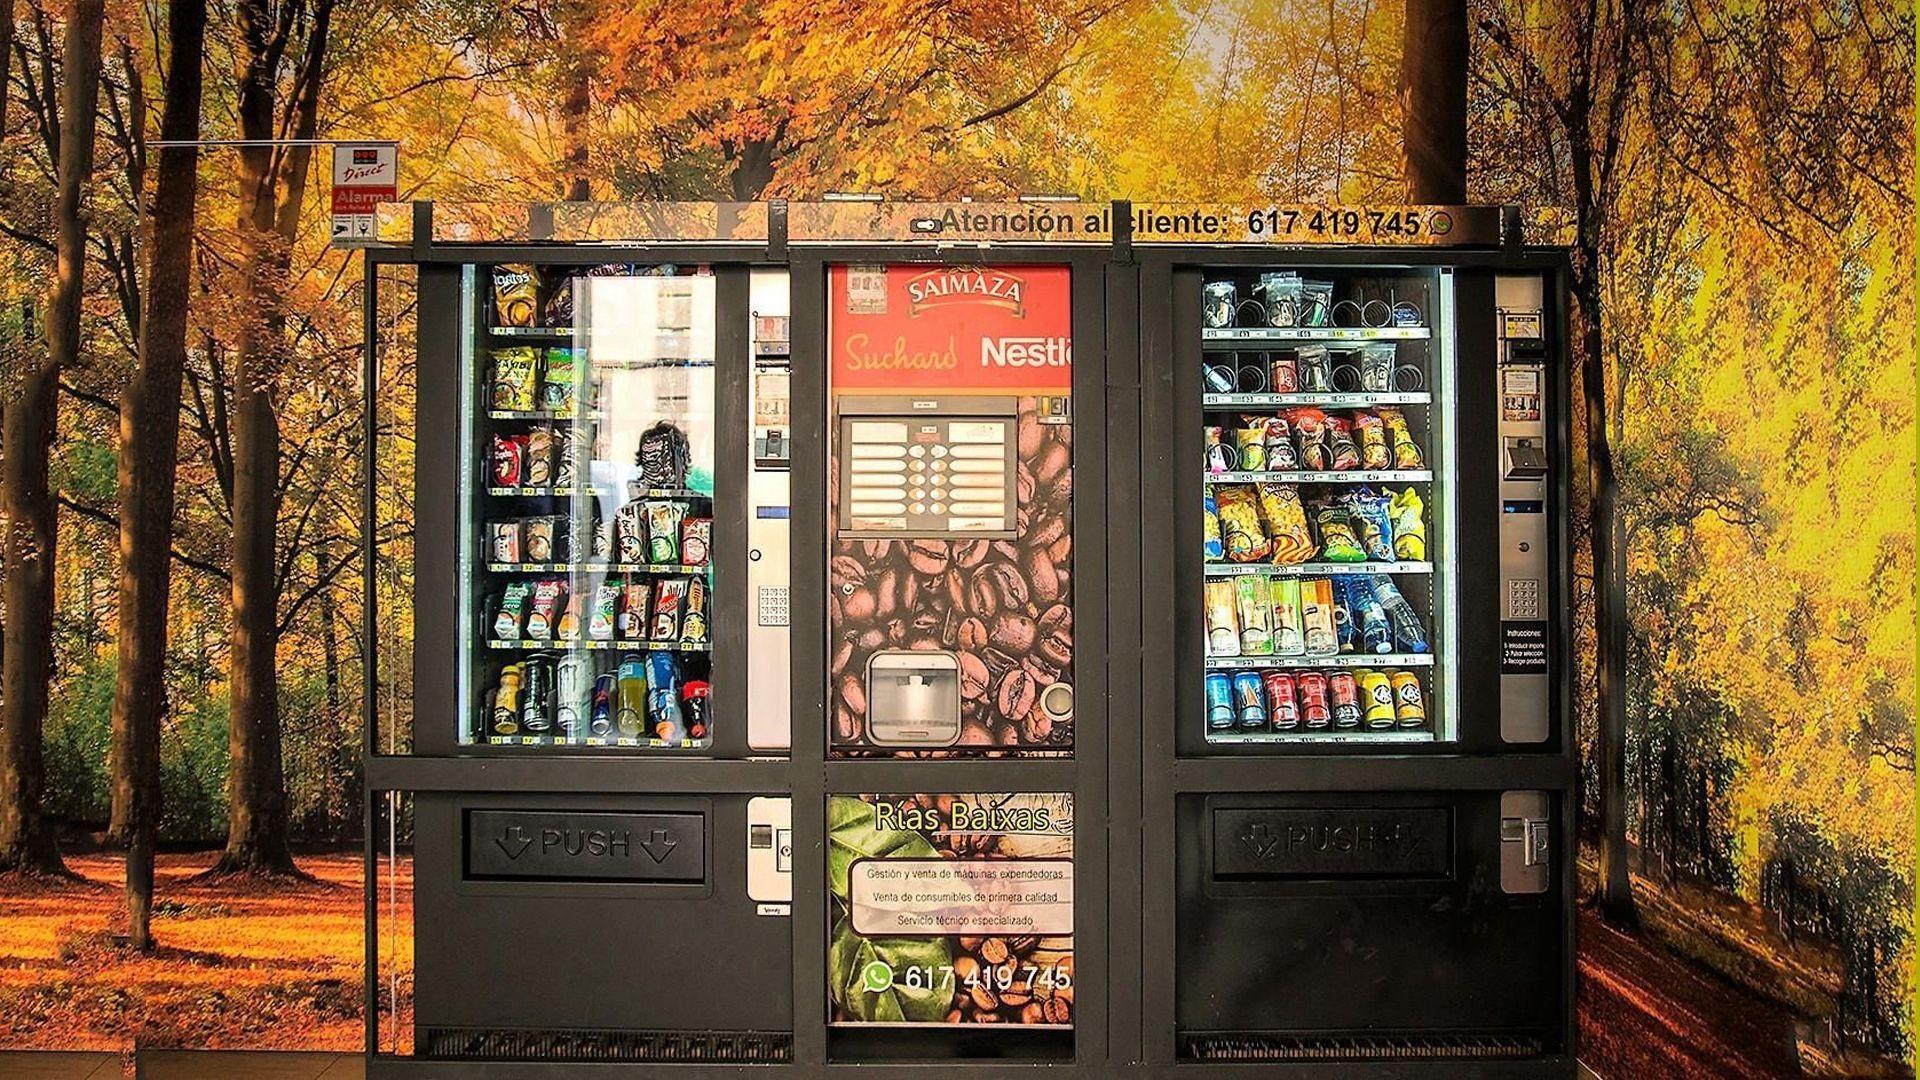 Empresa instaladora de máquinas de vending en Pontevedra